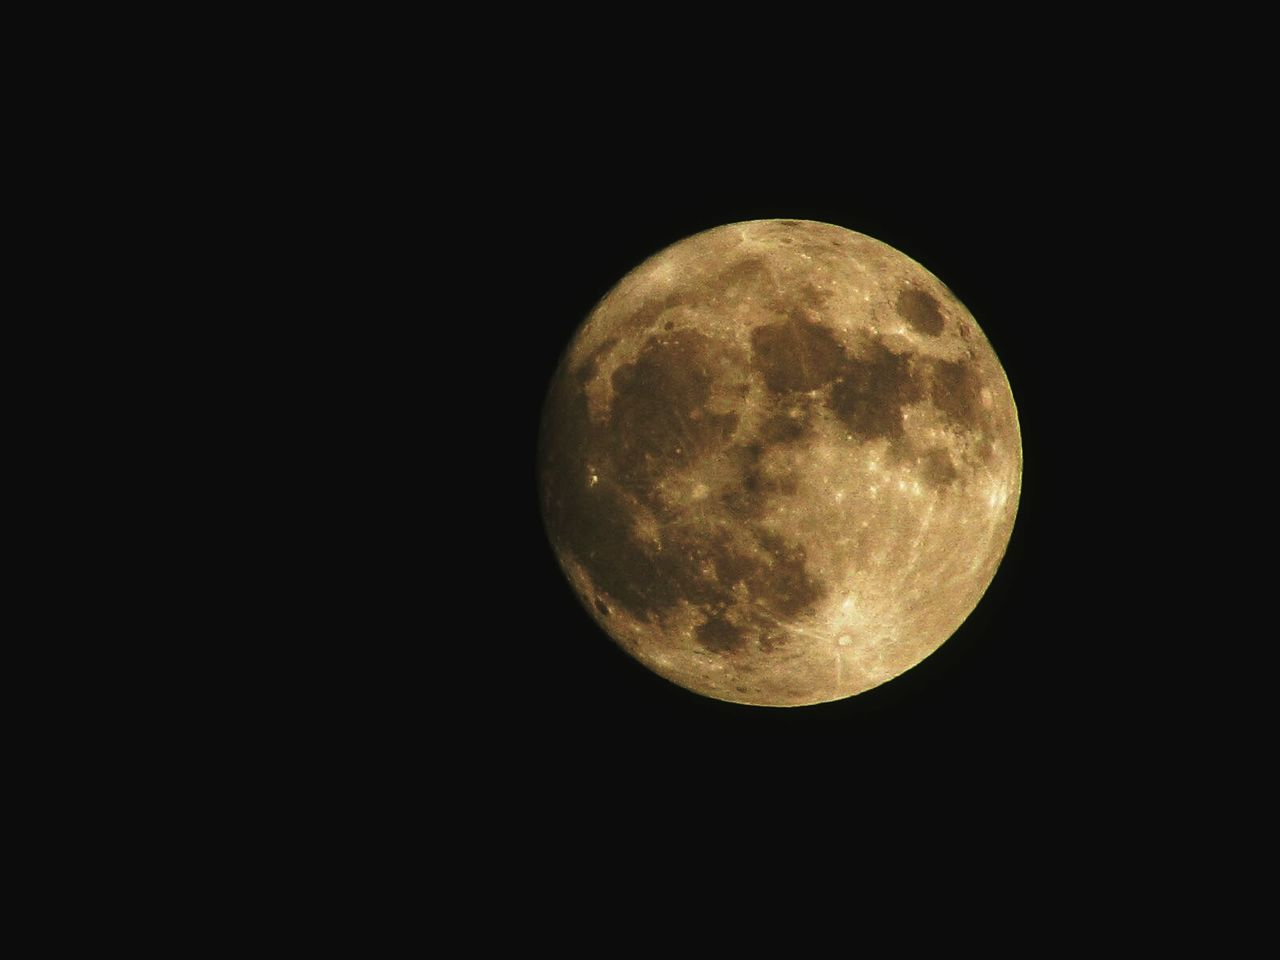 Super moon, see you in 2034 Full Moon Super Moon 2016 Black Background Moon Surface EyeEm November Getting Inspired EyeEm Best Shots Close-up